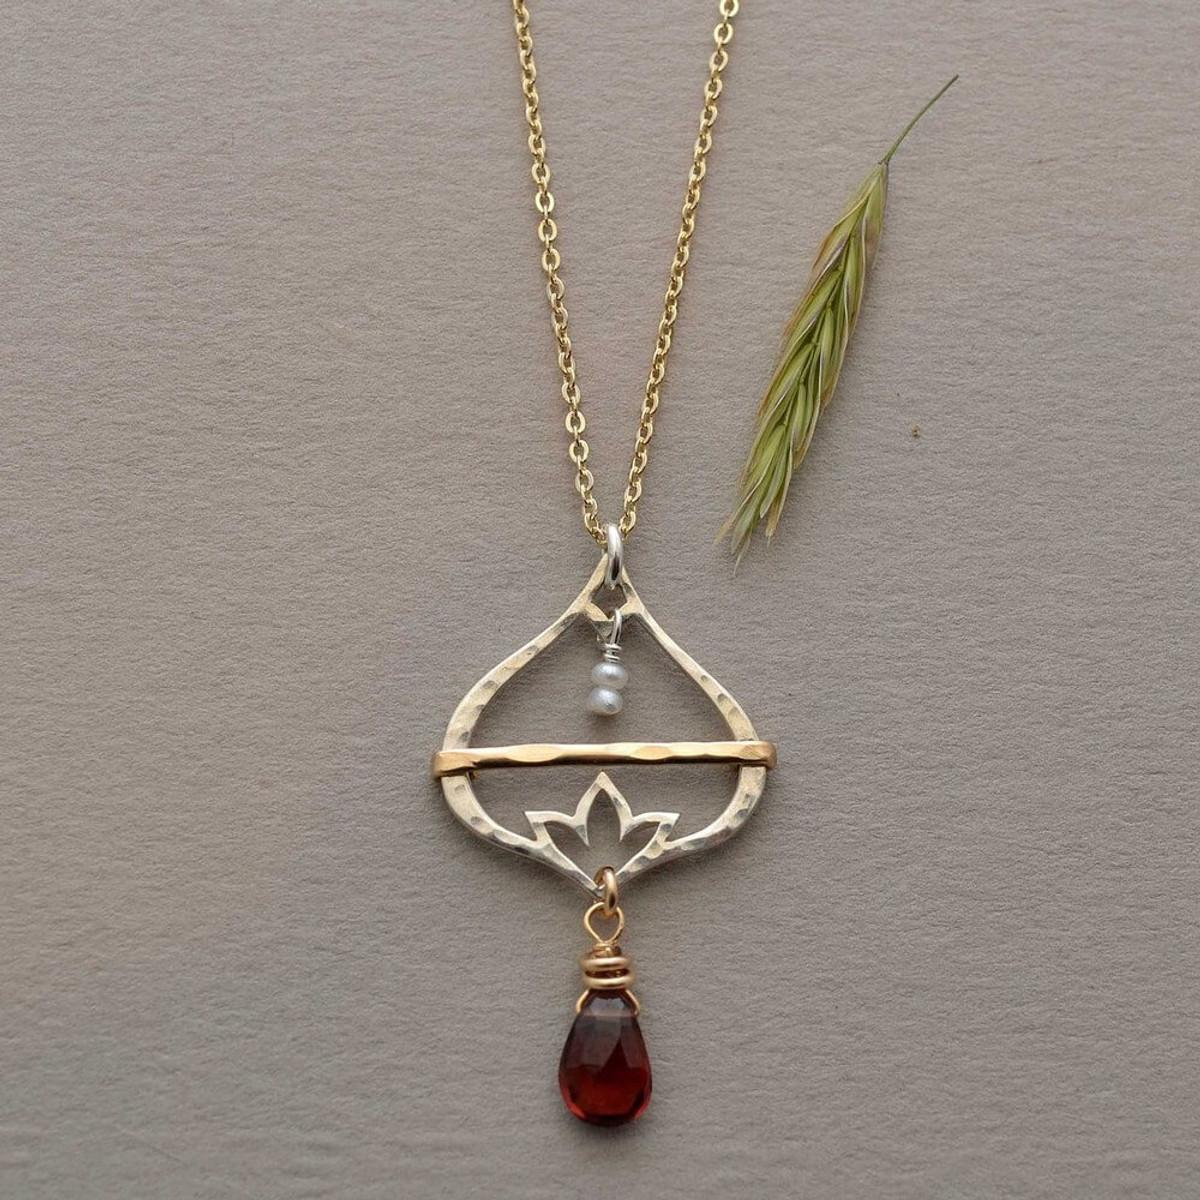 Handmade Lotus Flower Necklace Plumb Line Jewelry